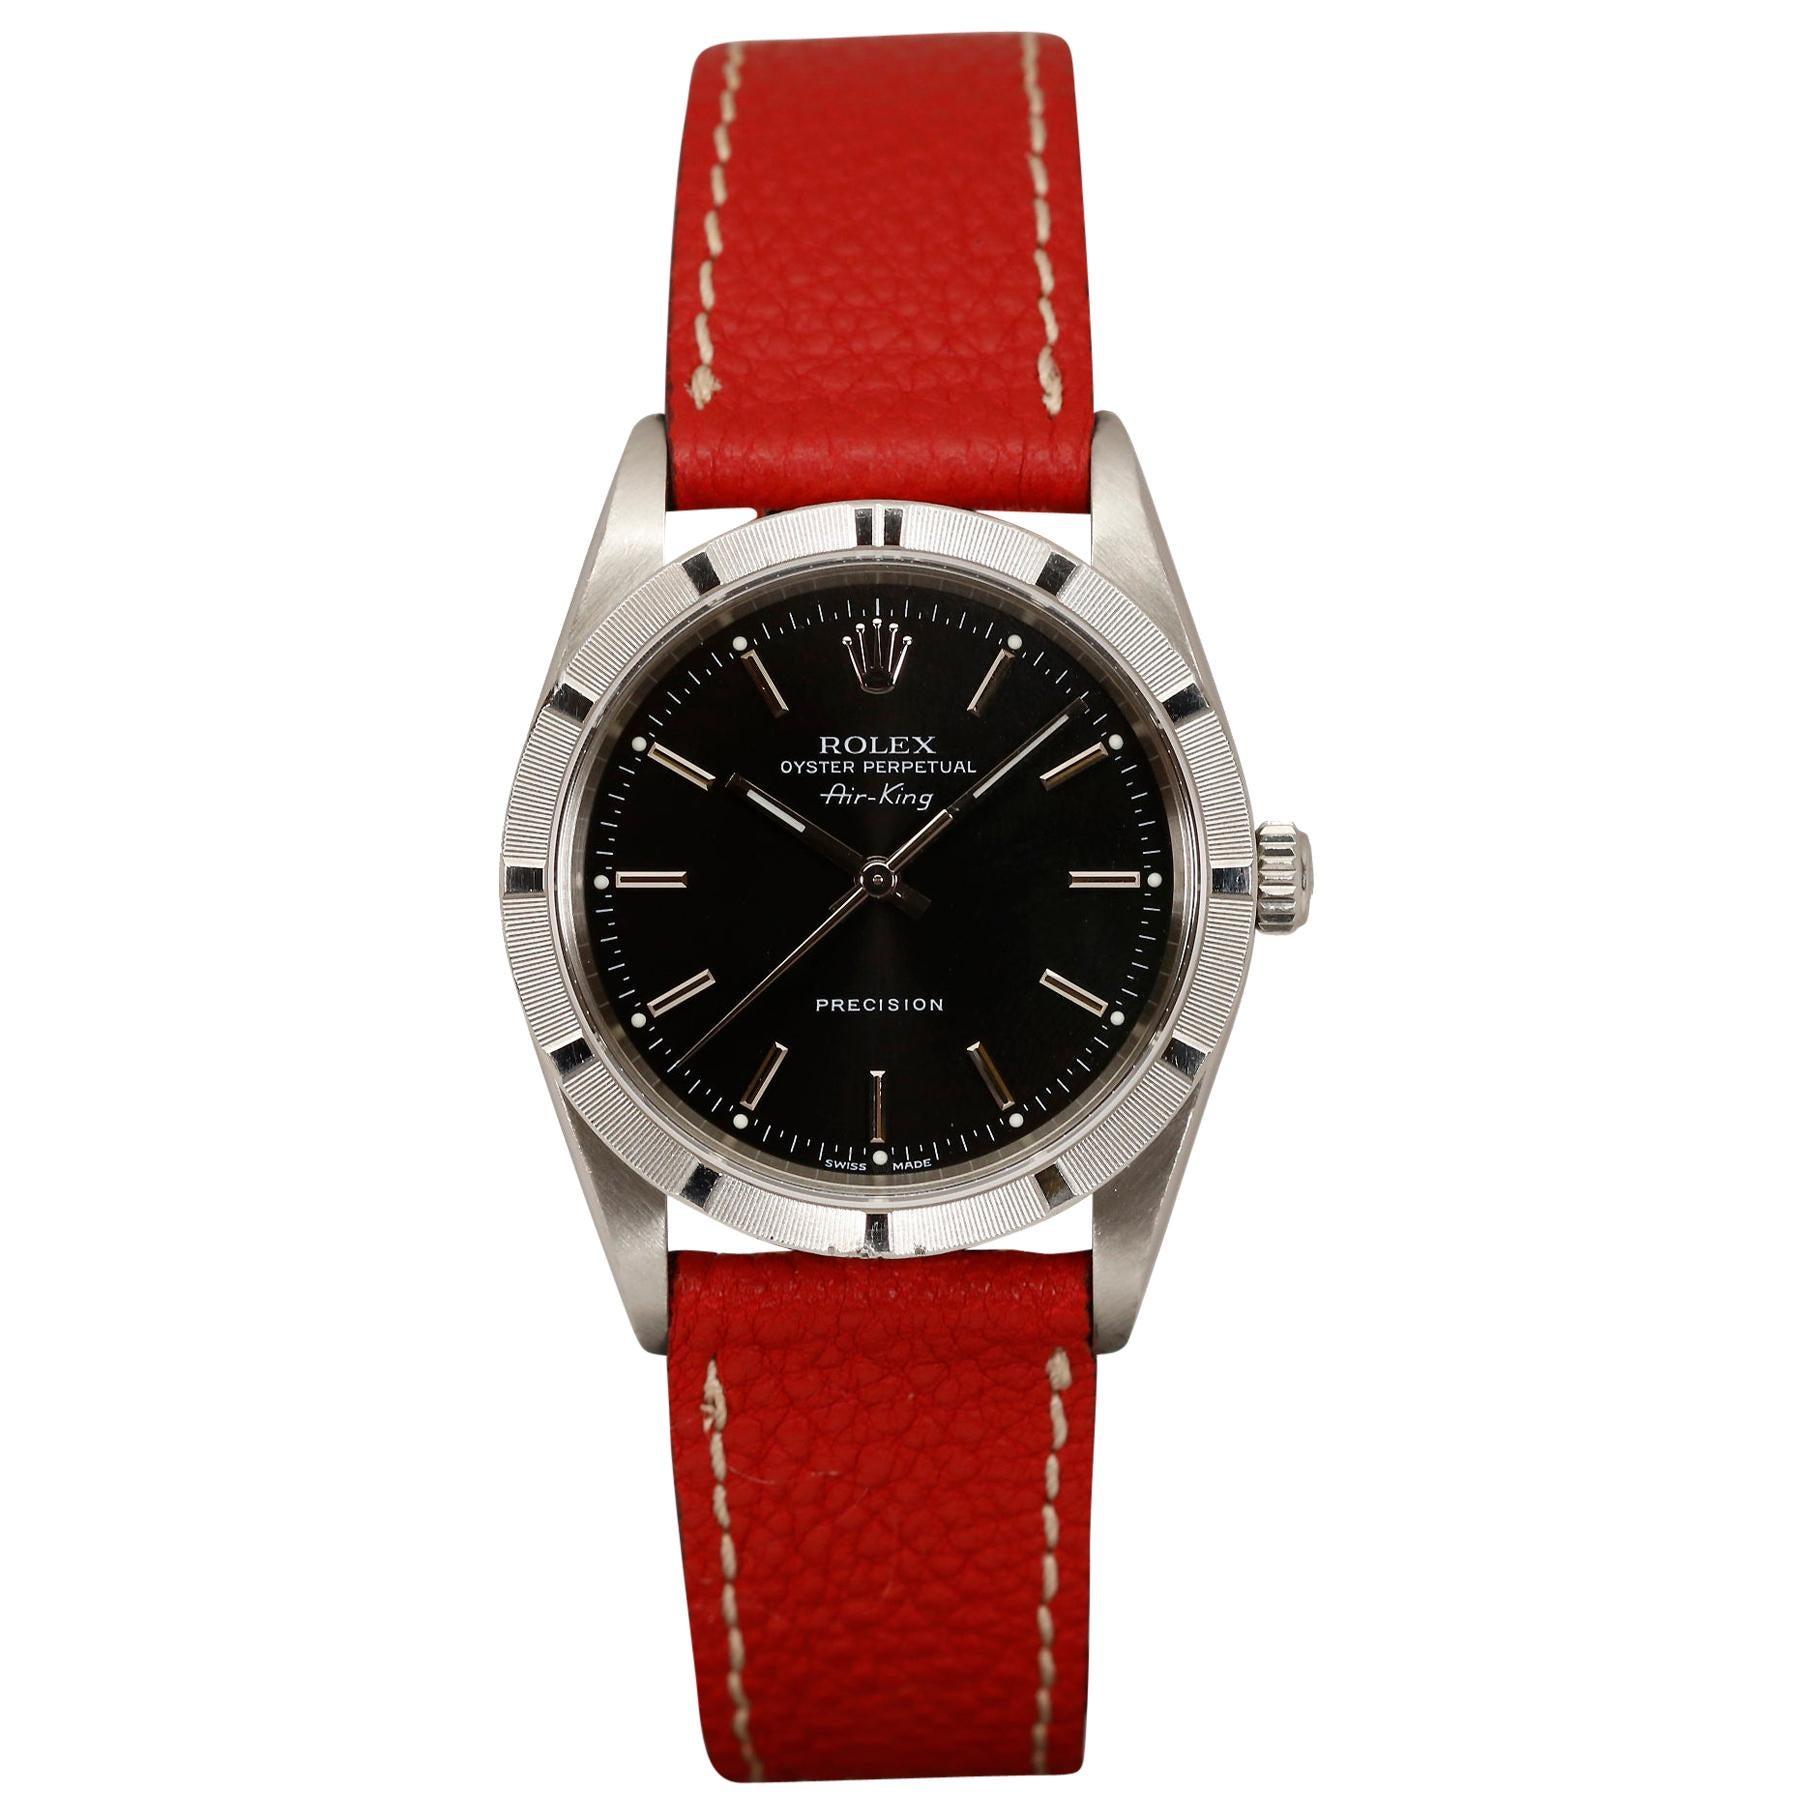 Rolex Air King Precision Stainless Steel Ref 14010M Wristwatch, circa 2006